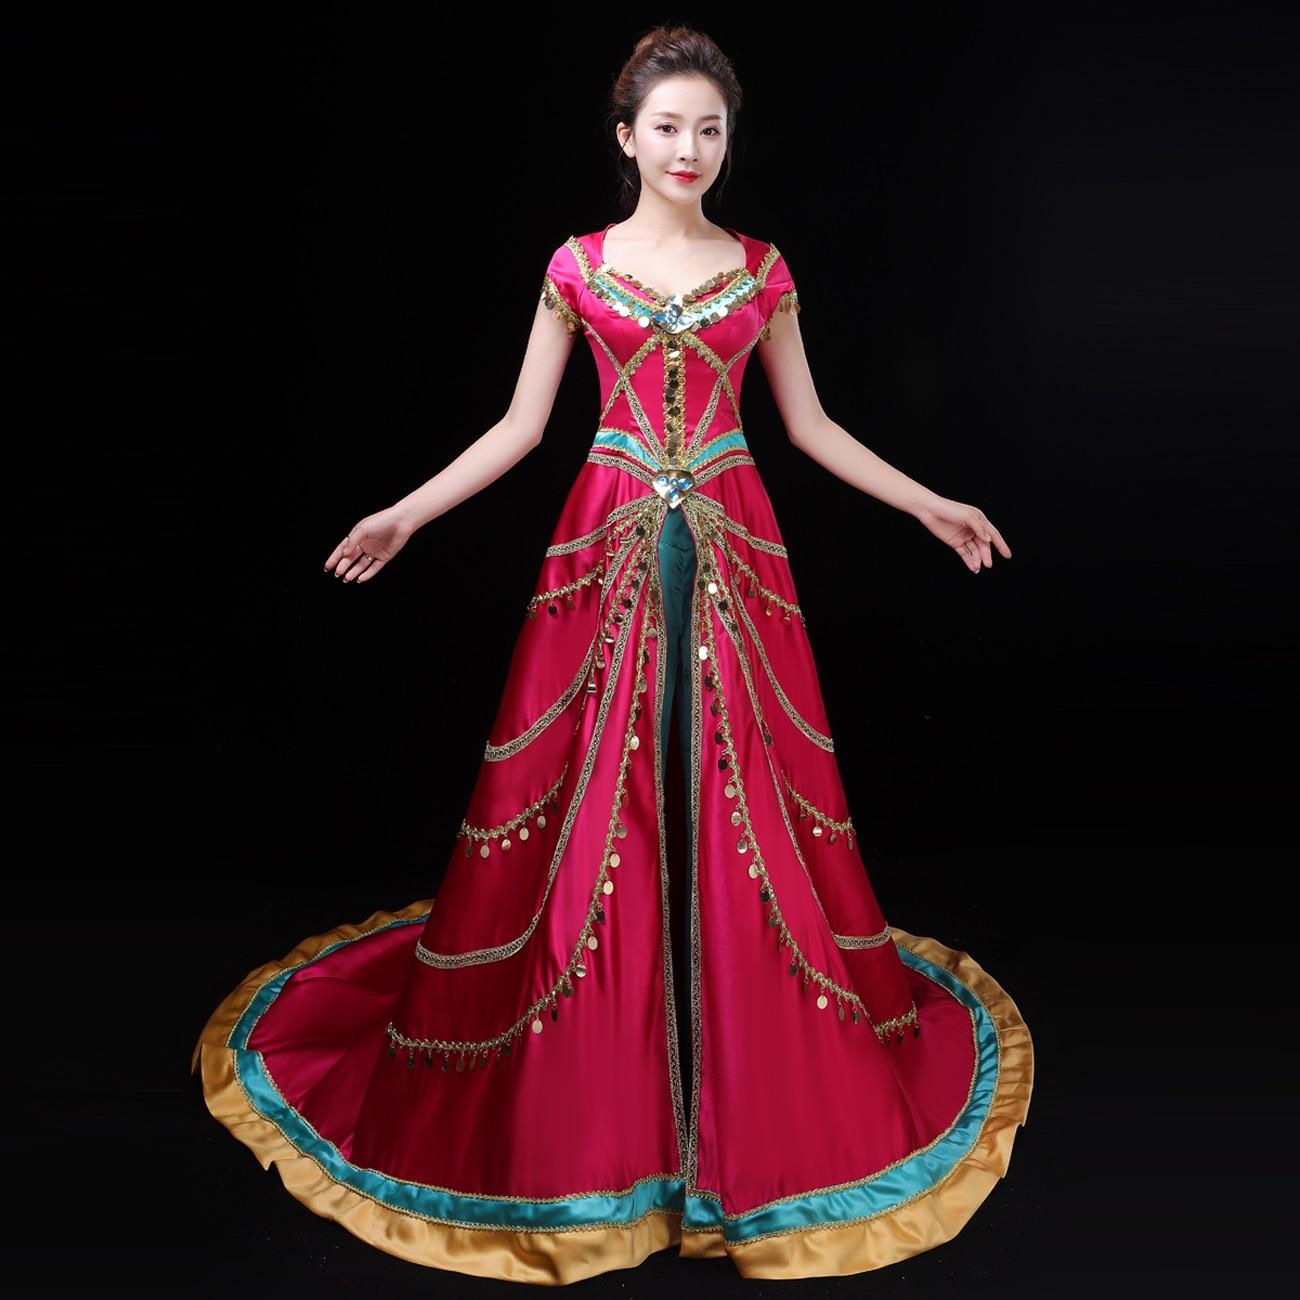 2019 Movie Aladdin Princess Jasmine Cosplay Costume Fancy Dress